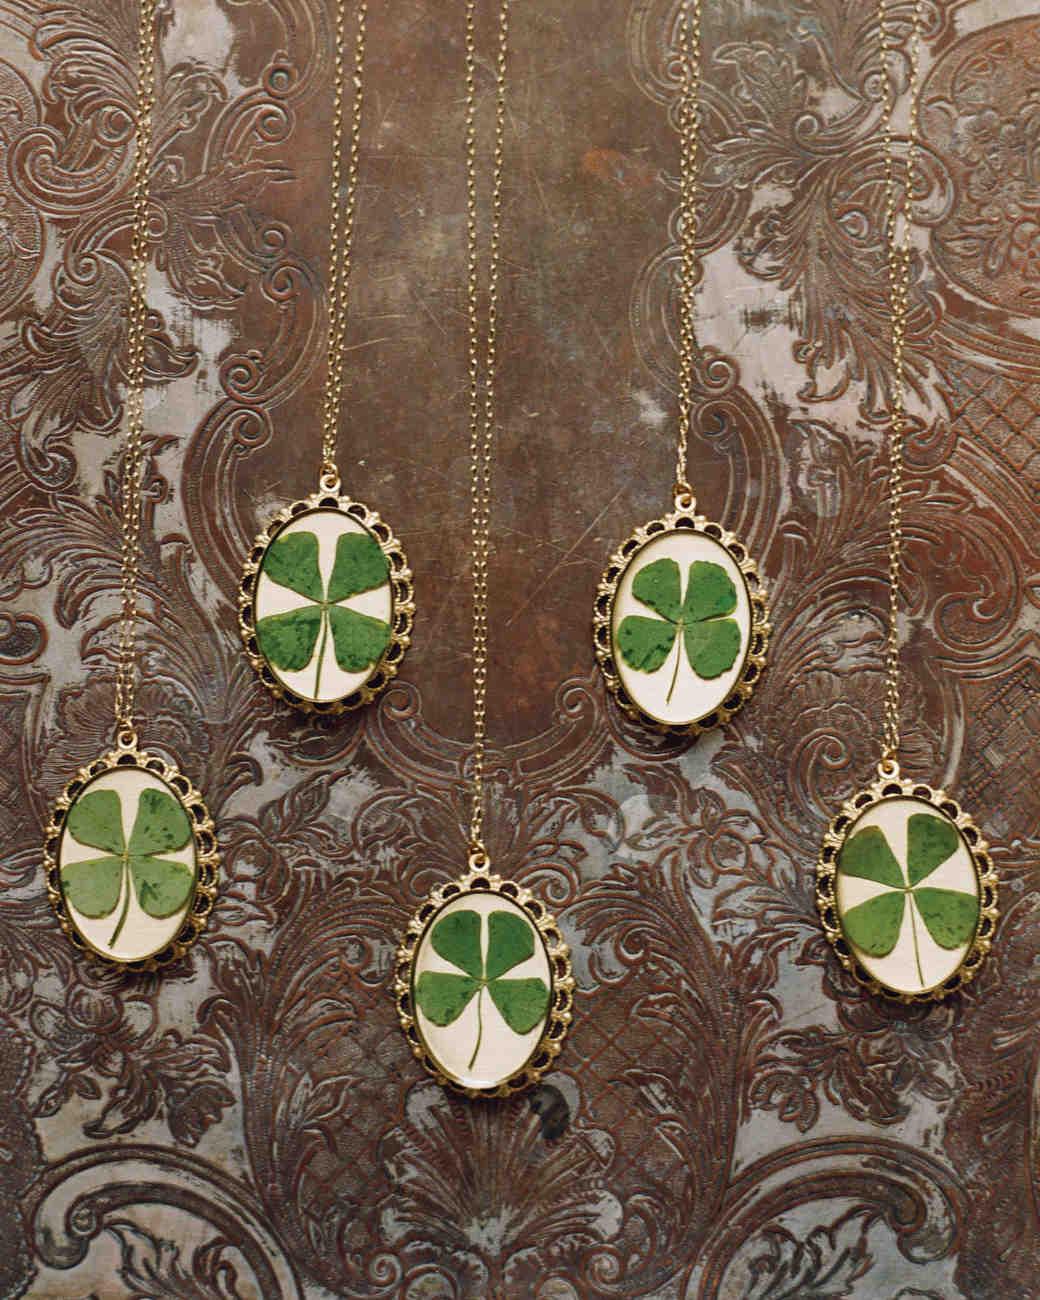 corbin-thatcher-pendants-1089-mwds109911.jpg